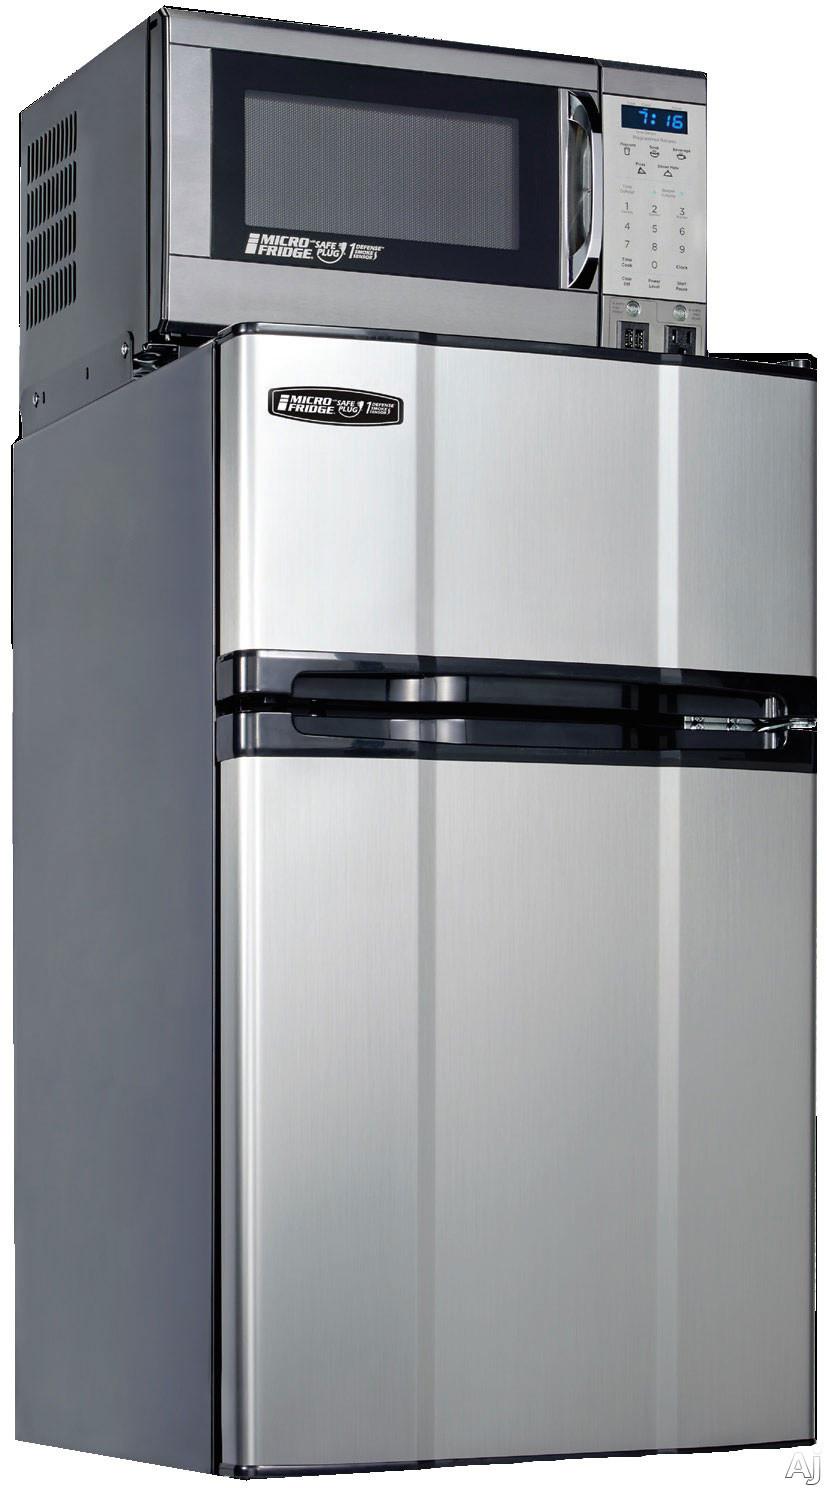 Microfridge 31mf47d1s 3 1 Cu Ft Compact Refrigerator